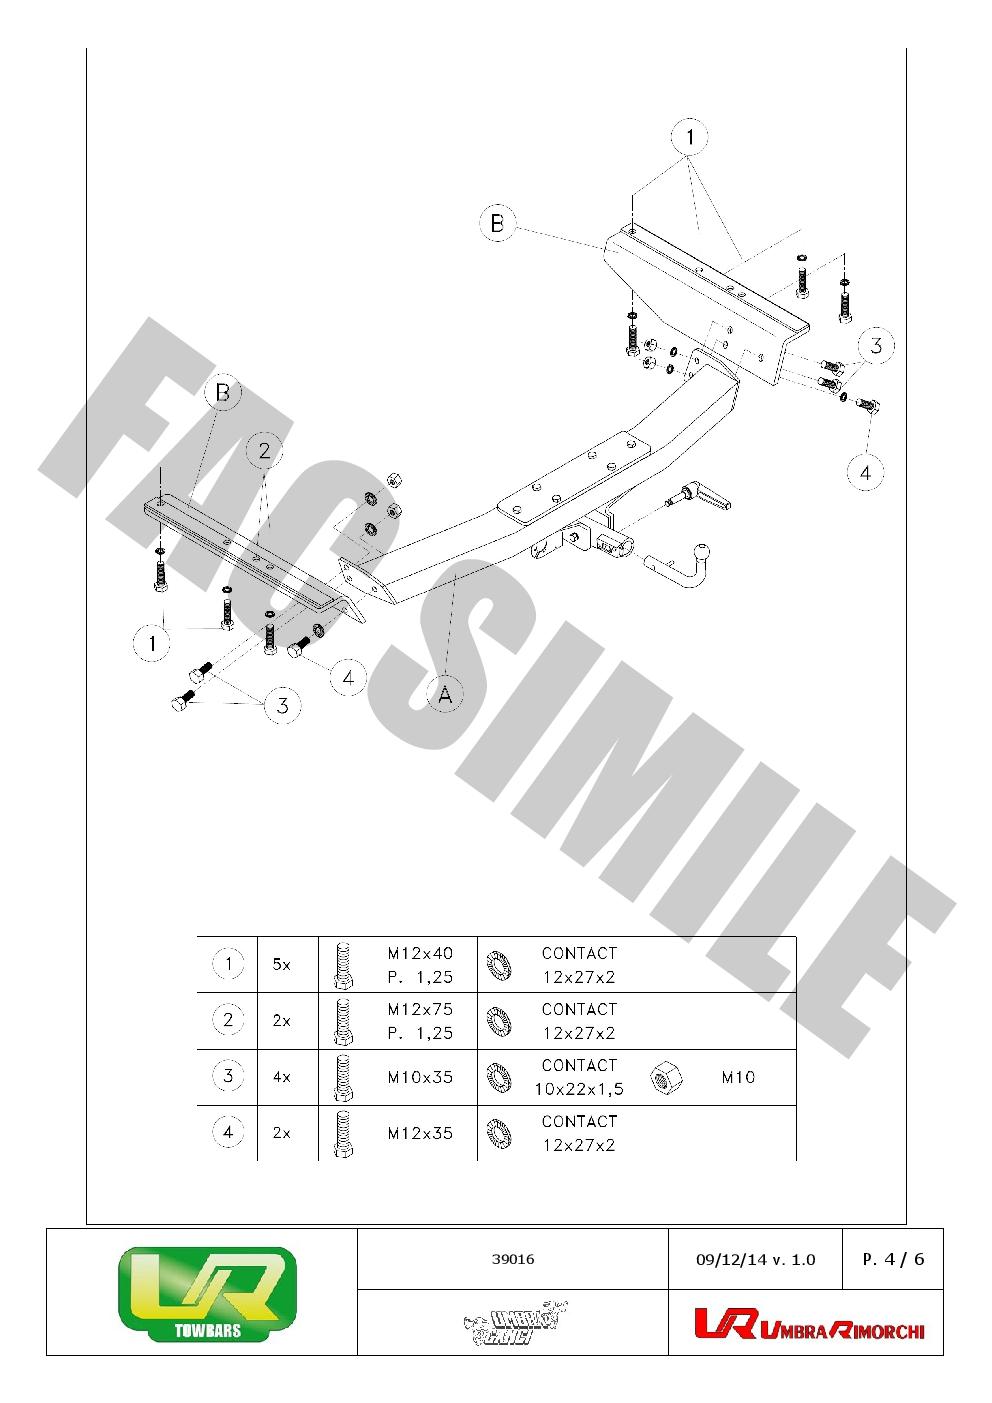 Detach Towbar 13pin C2 Wiring For Toyota Land Cruiser 90 4wd 4dr Schematic